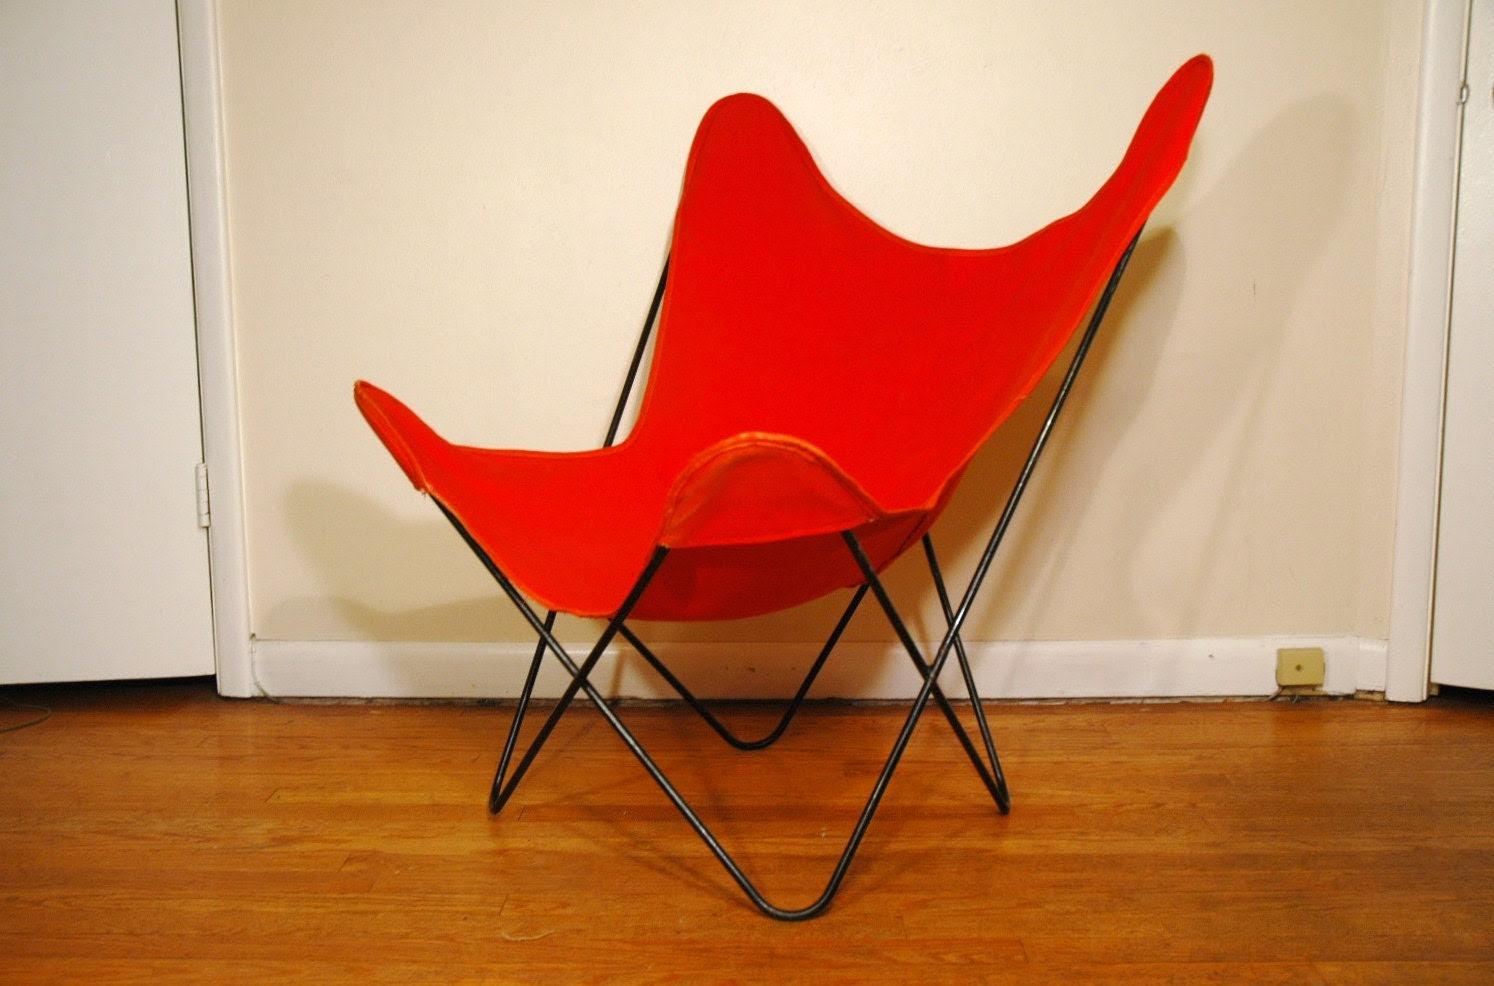 Knoll Hardoy Butterfly Chair - Mid Century Modern Orange B.K.F. Chair